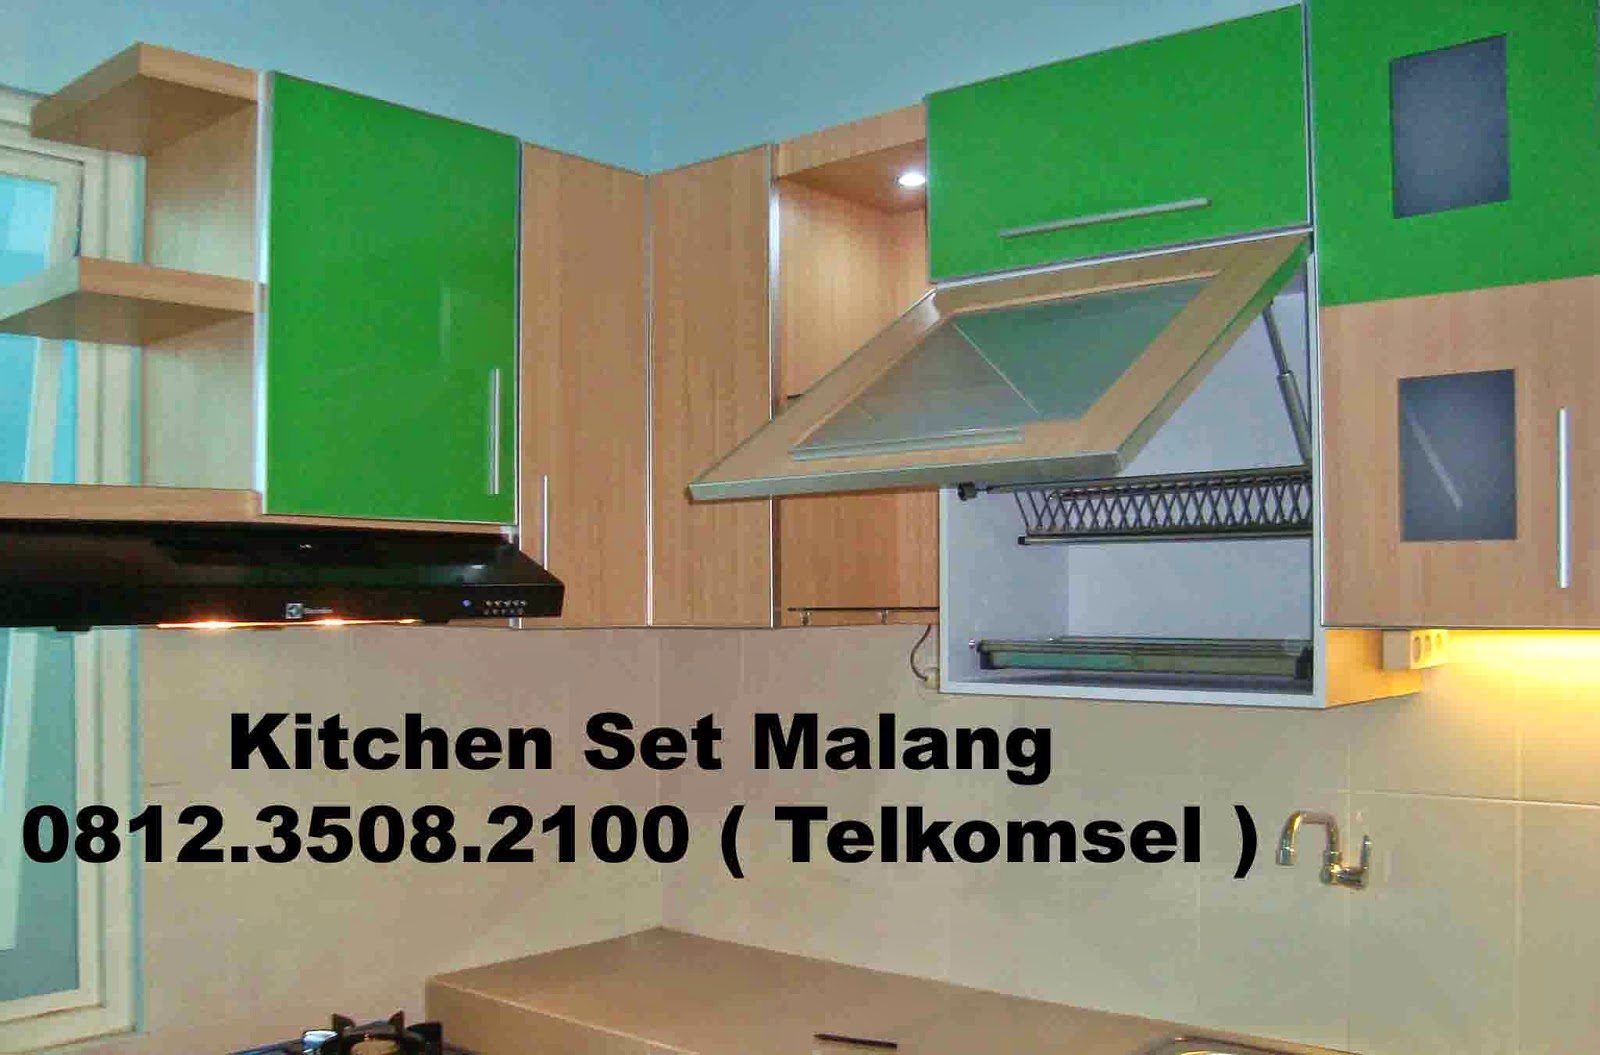 Toko Kitchen Set Malang, Daftar Harga Kitchen Set Malang | 08123.5082.100  (TELKOMSEL